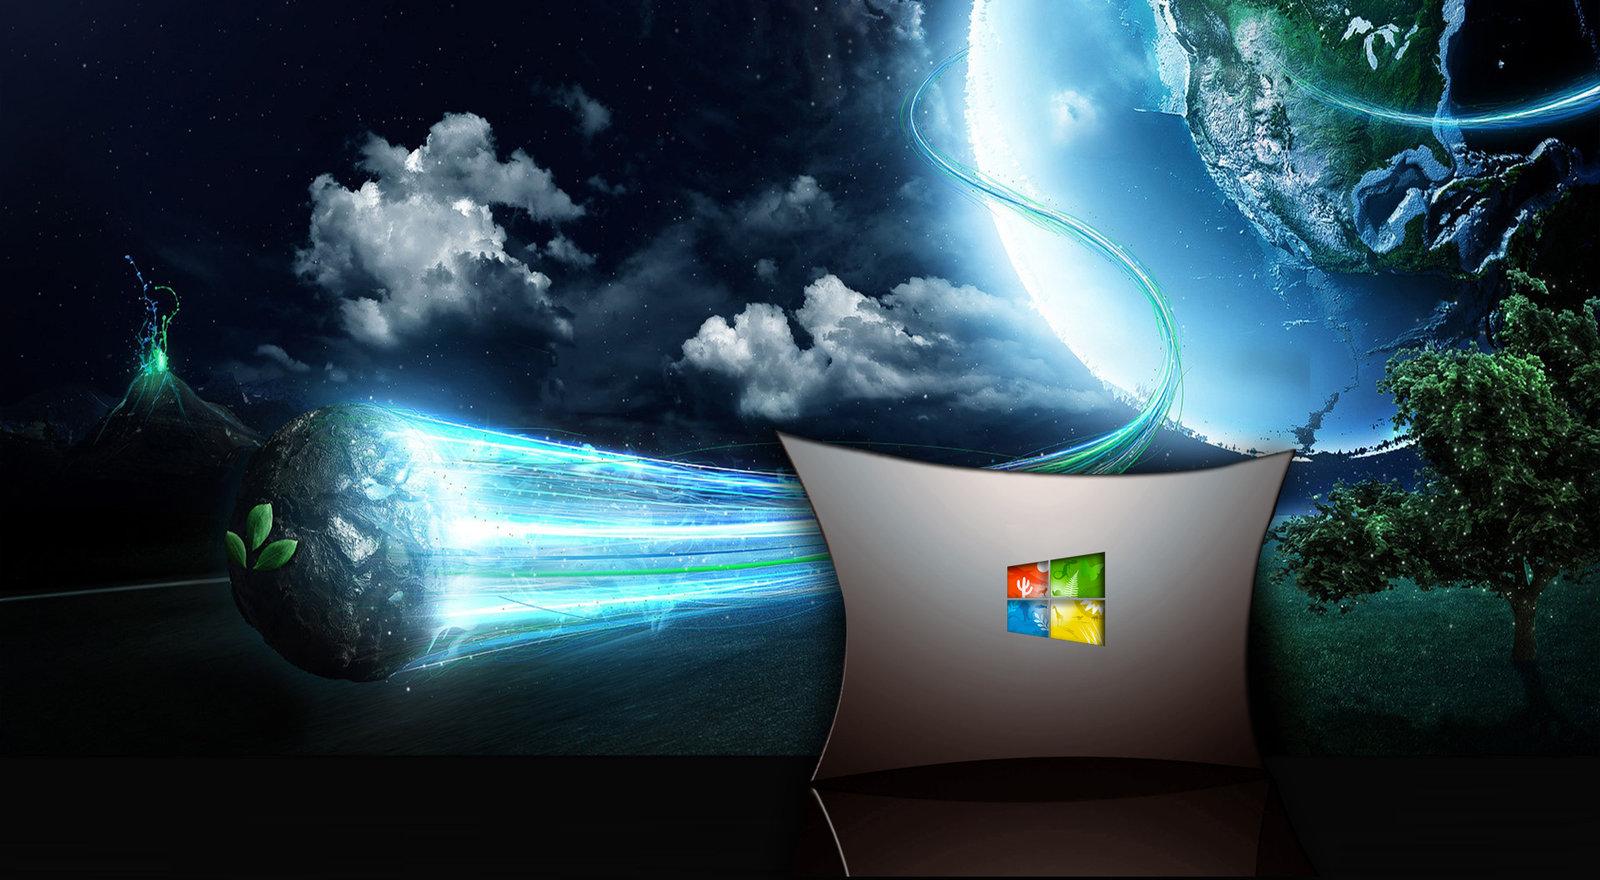 how to find pc mac address windows 8.1